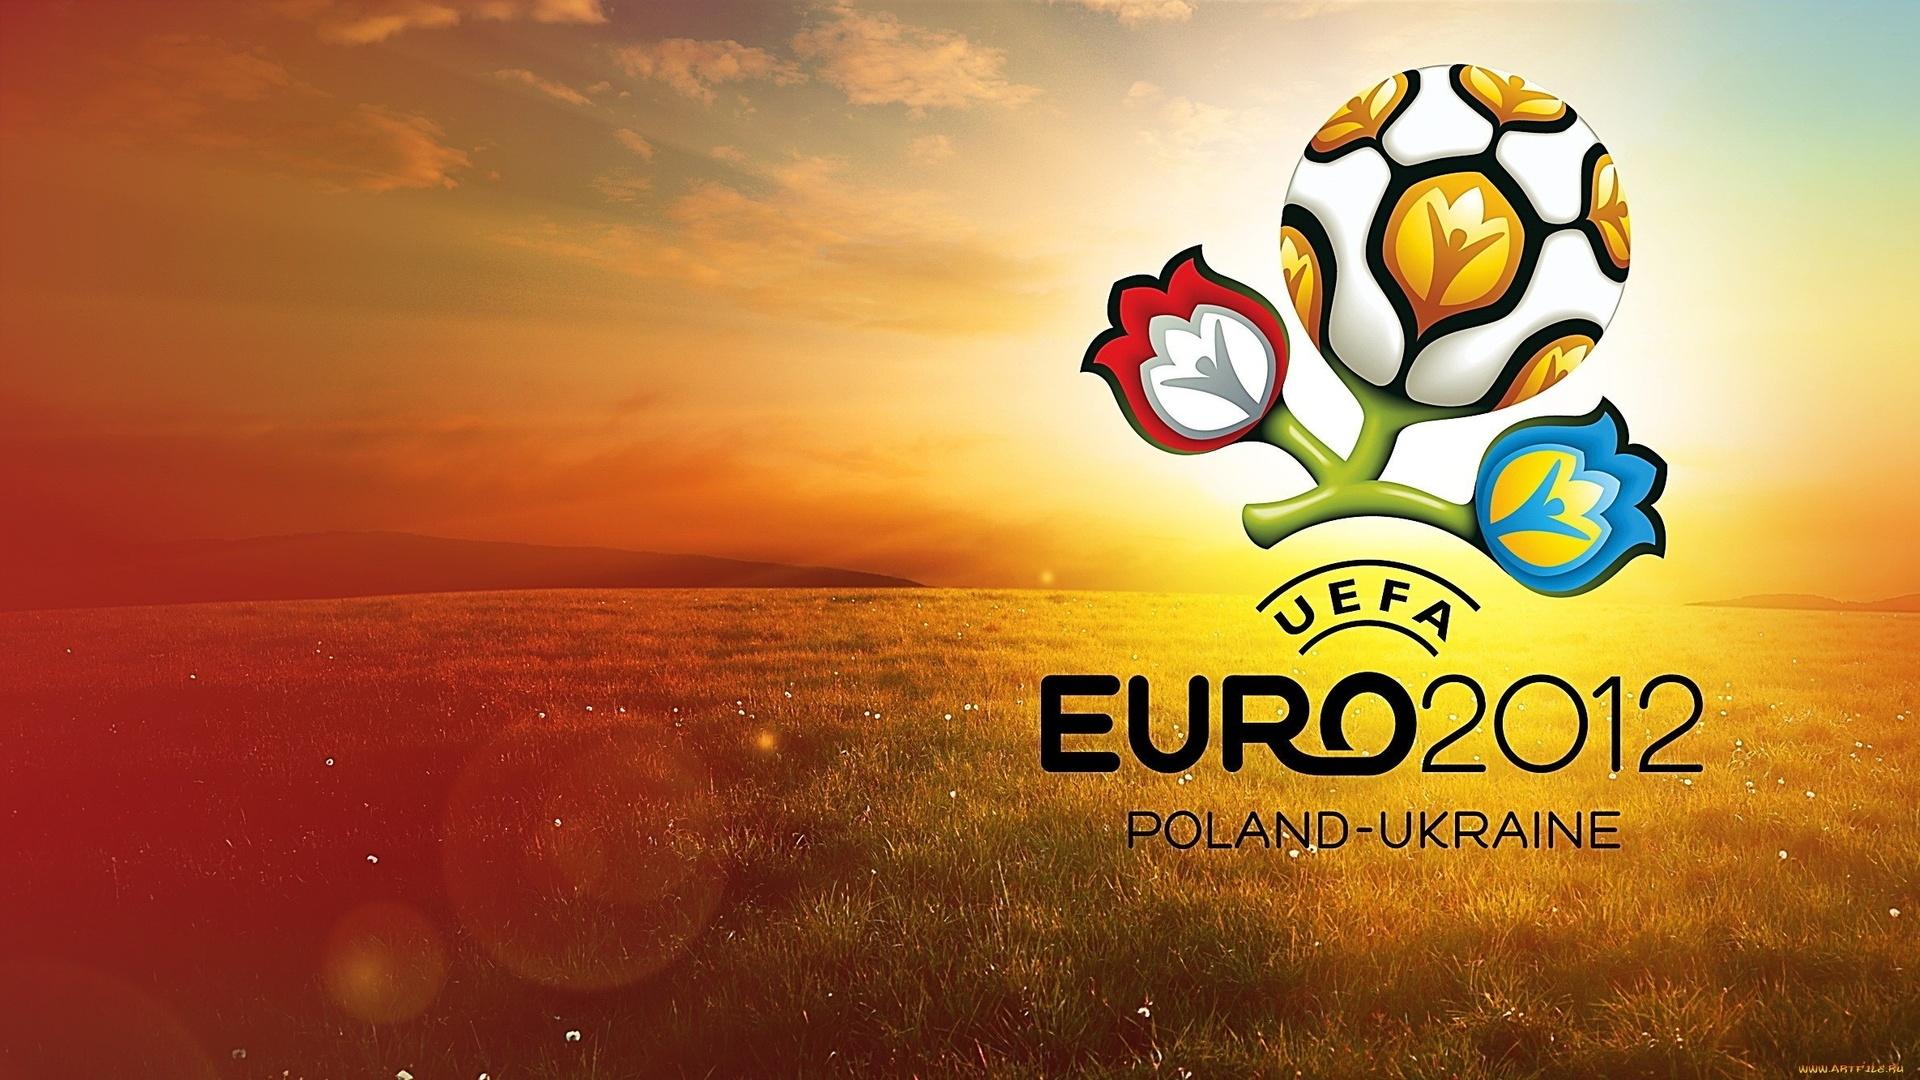 логотип евро 2012: